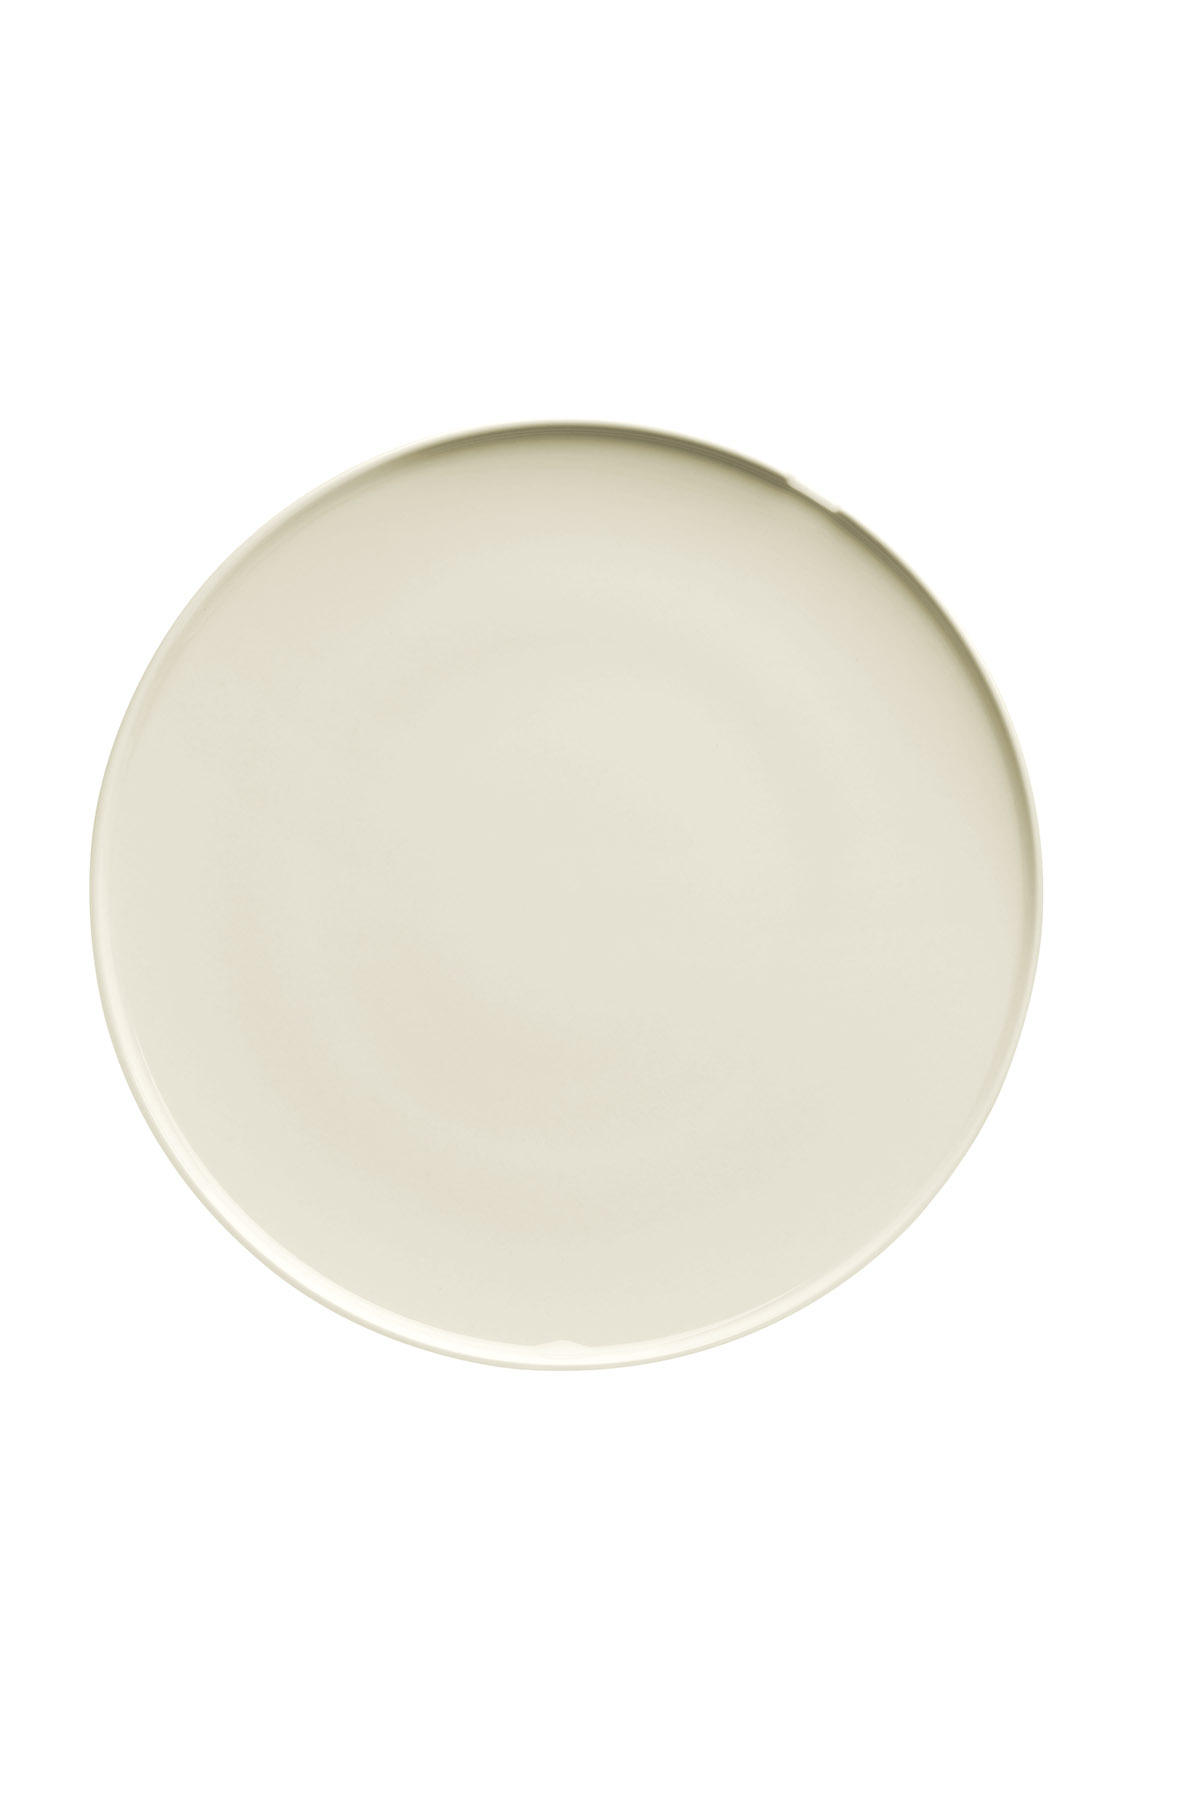 Kütahya Porselen Chef Taste Of 21 cm Düz Tabak Krem